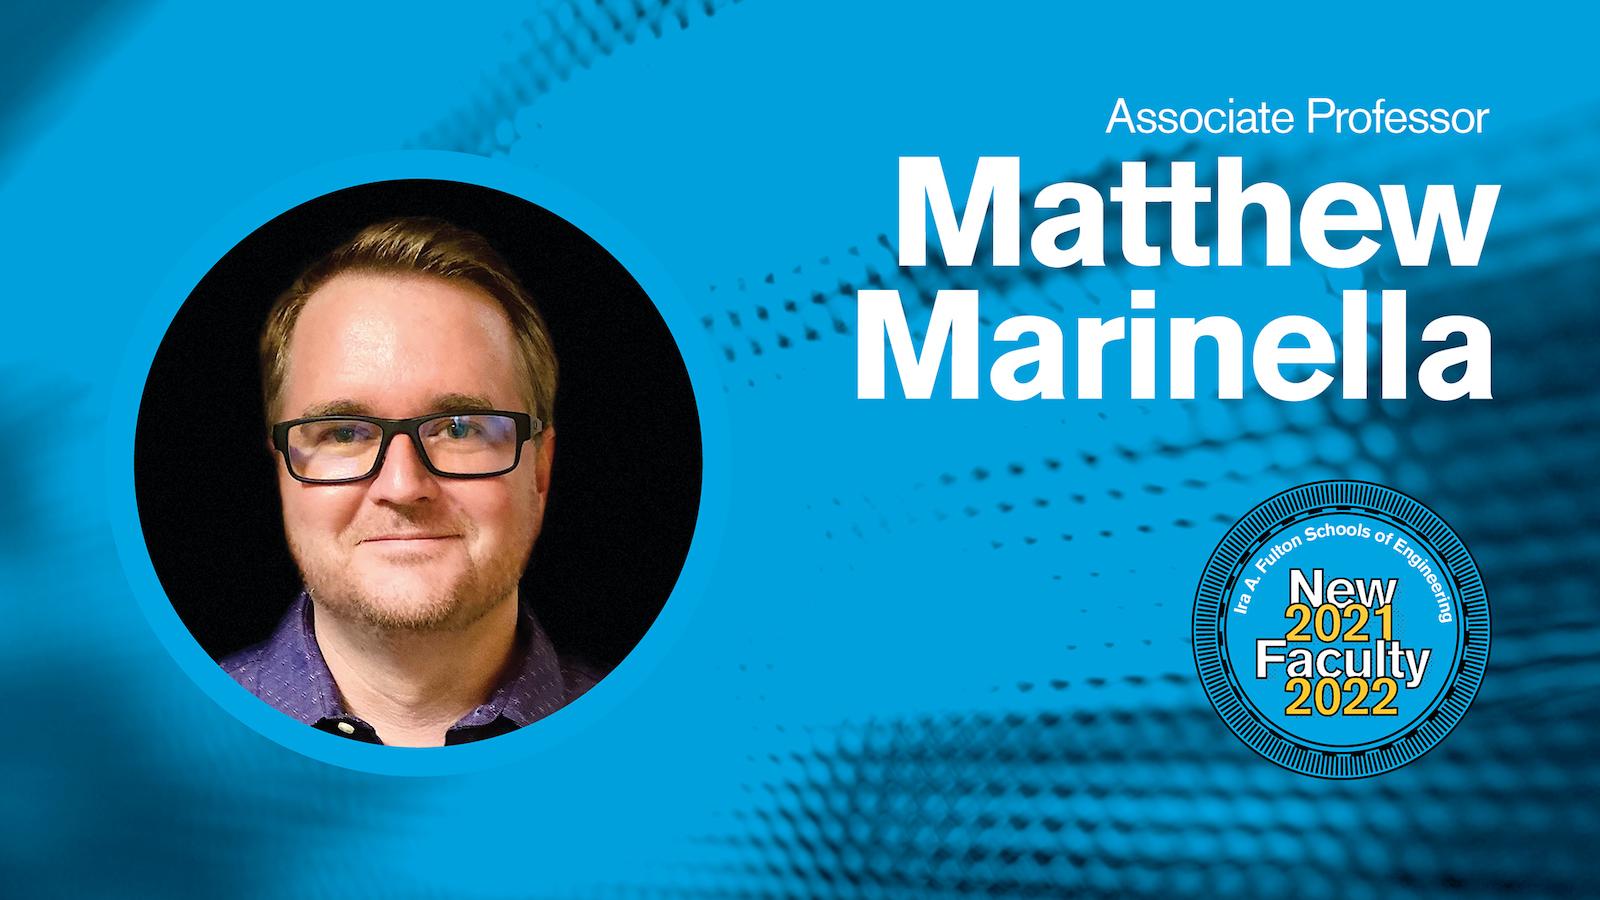 Matthew Marinella